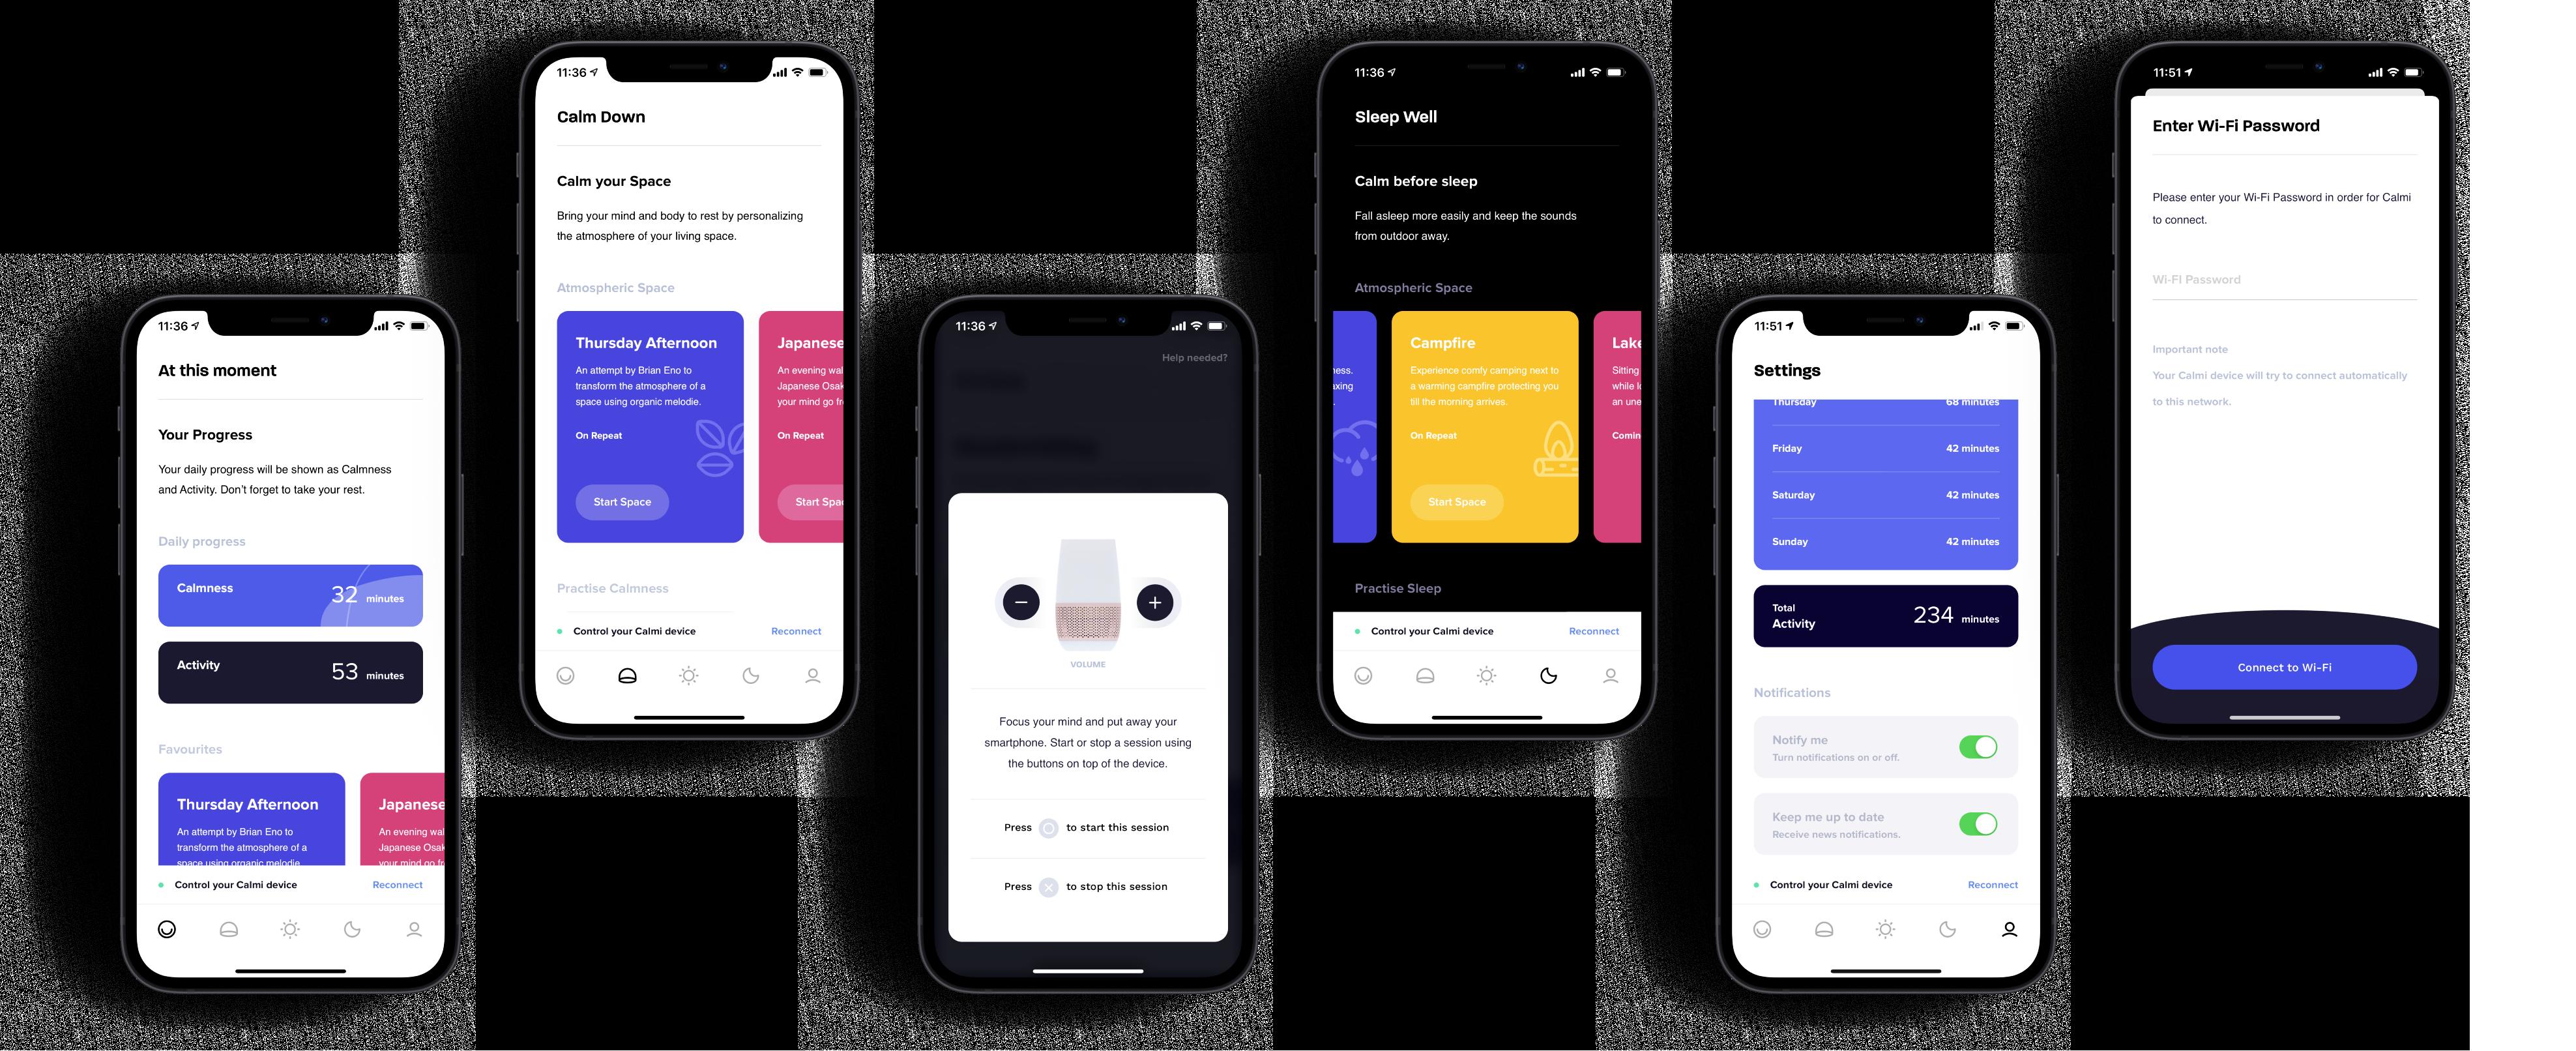 The design of the Calmi app displayed in screenshots.